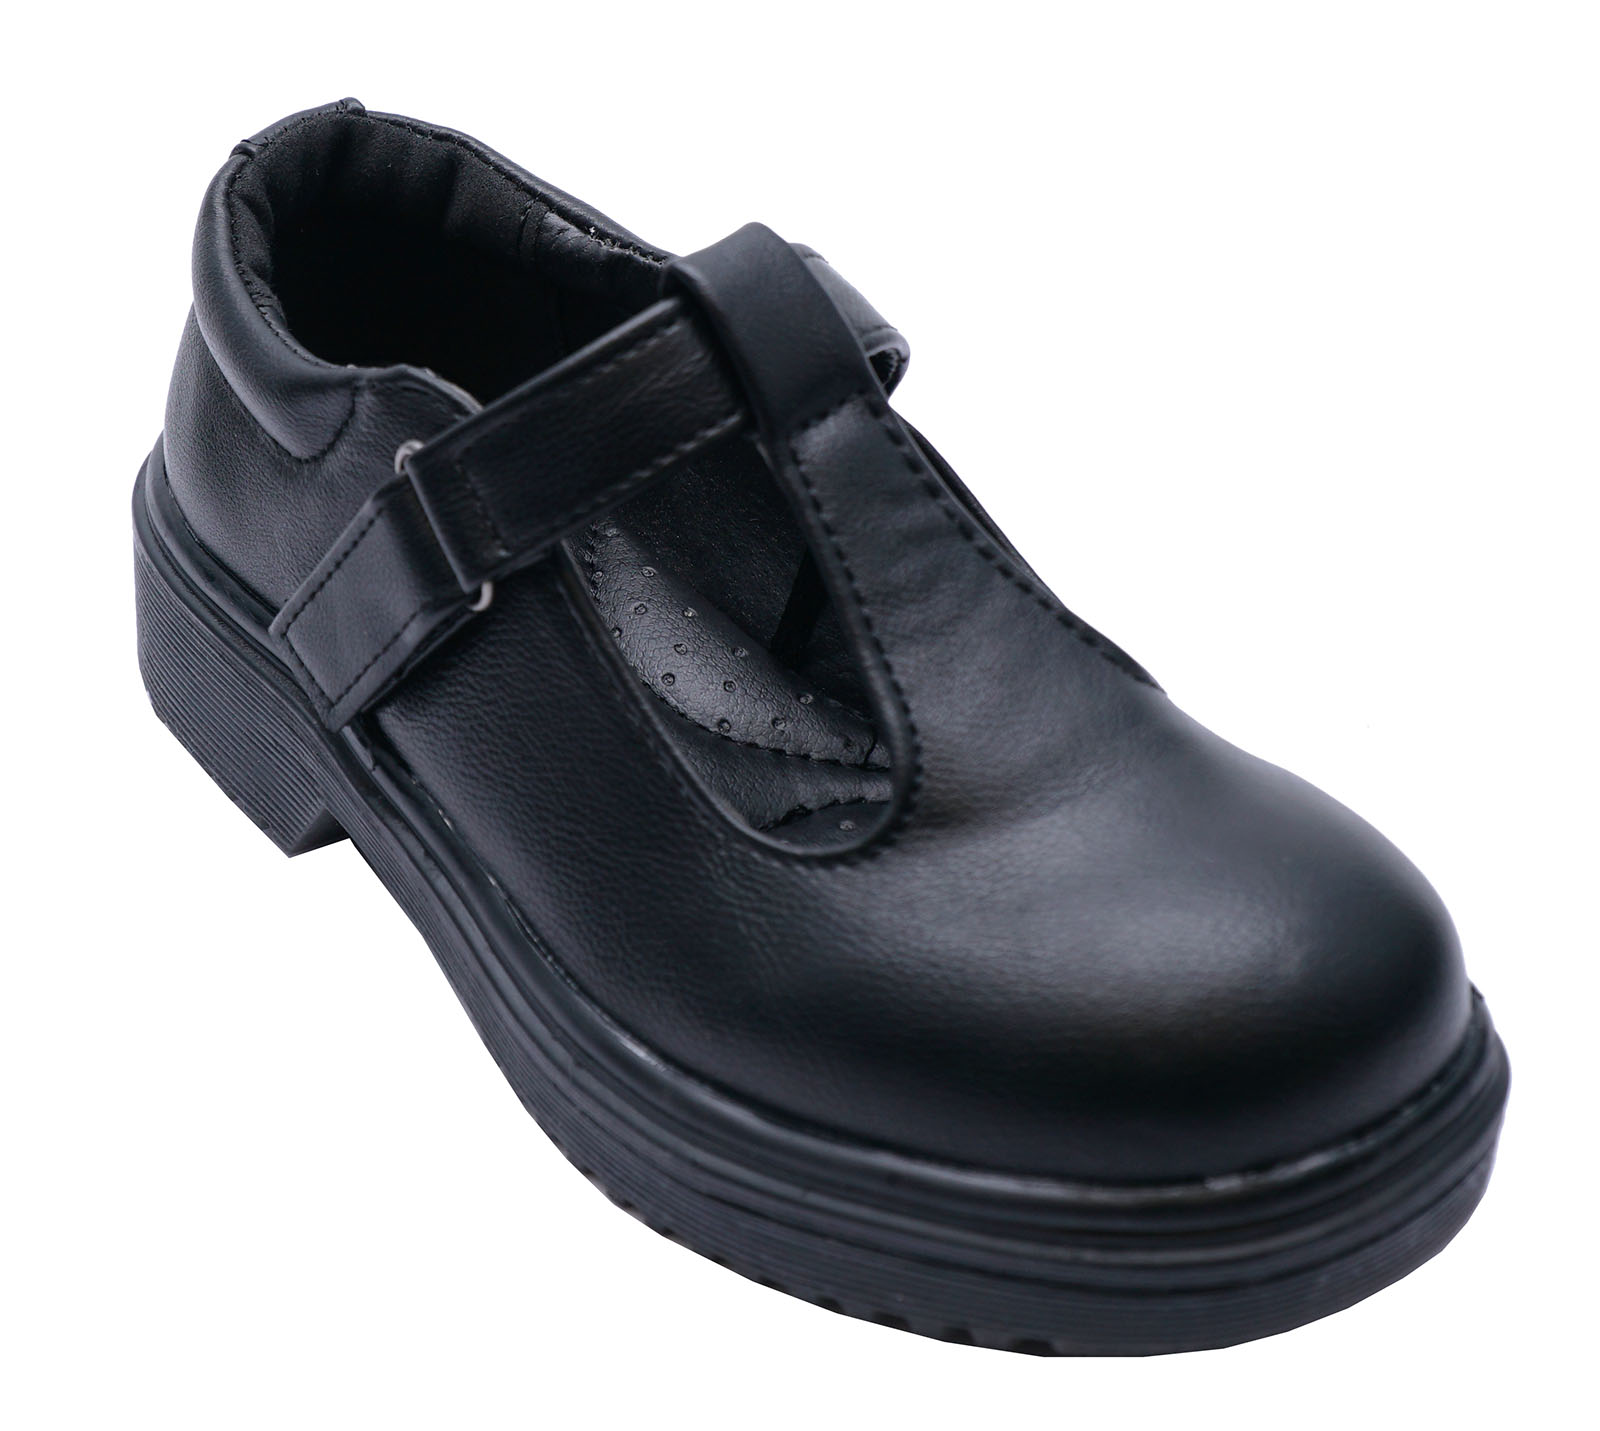 GIRLS BLACK BACK TO SCHOOL BUCKLE ZIP UP CASUAL WINTER BOOTS KIDS UK SIZE 10-5